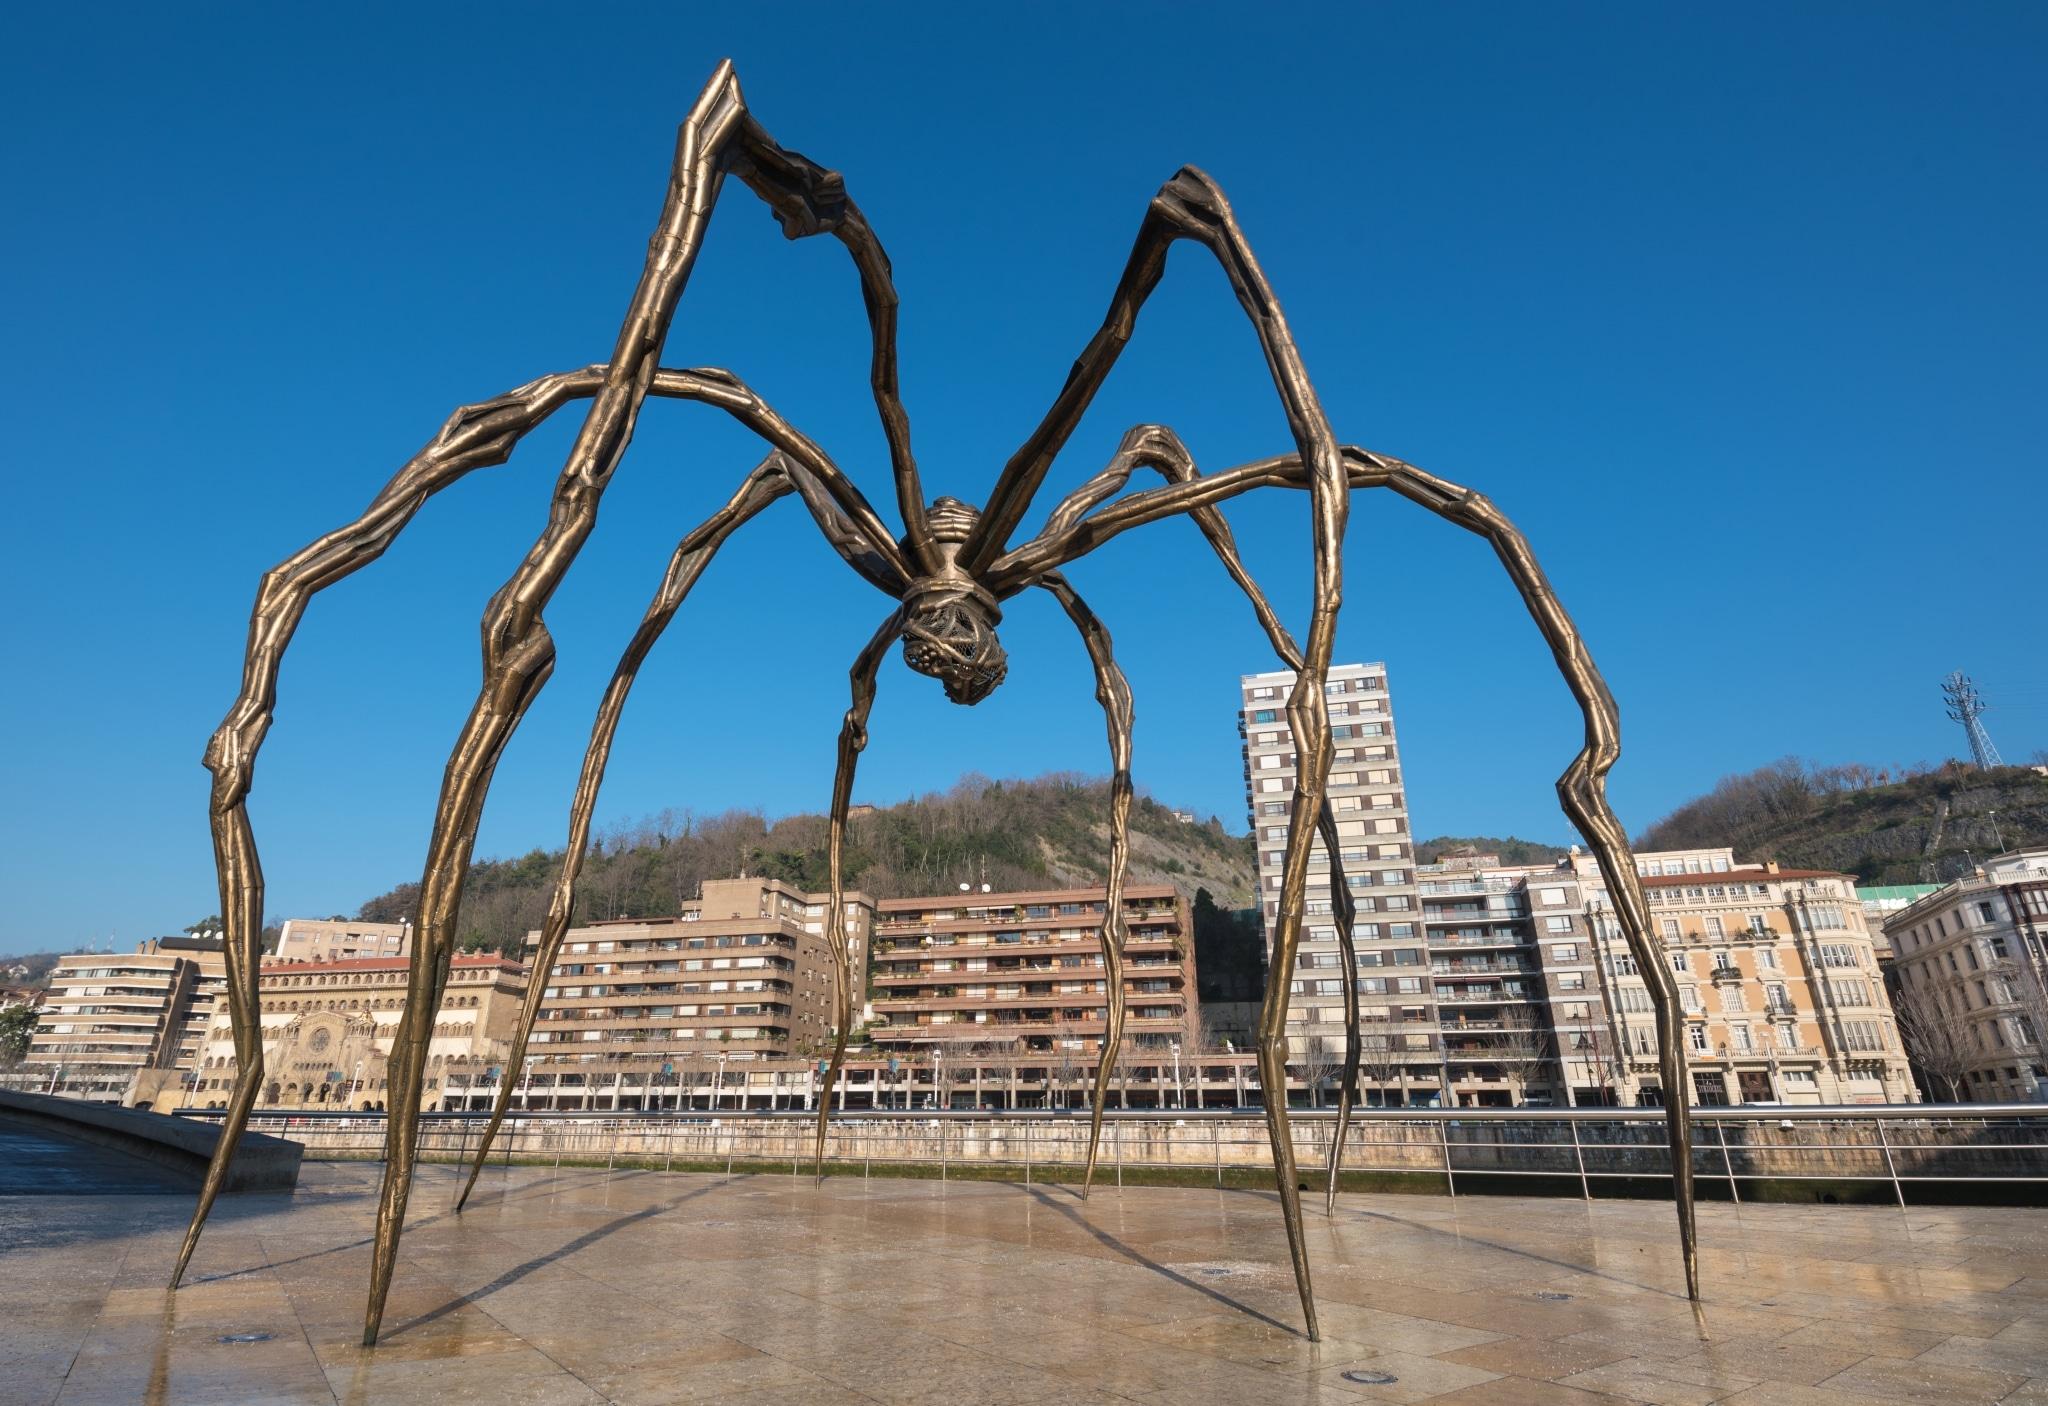 Mamá de Louise Bourgeois en el Museo Guggenheim Bilbao